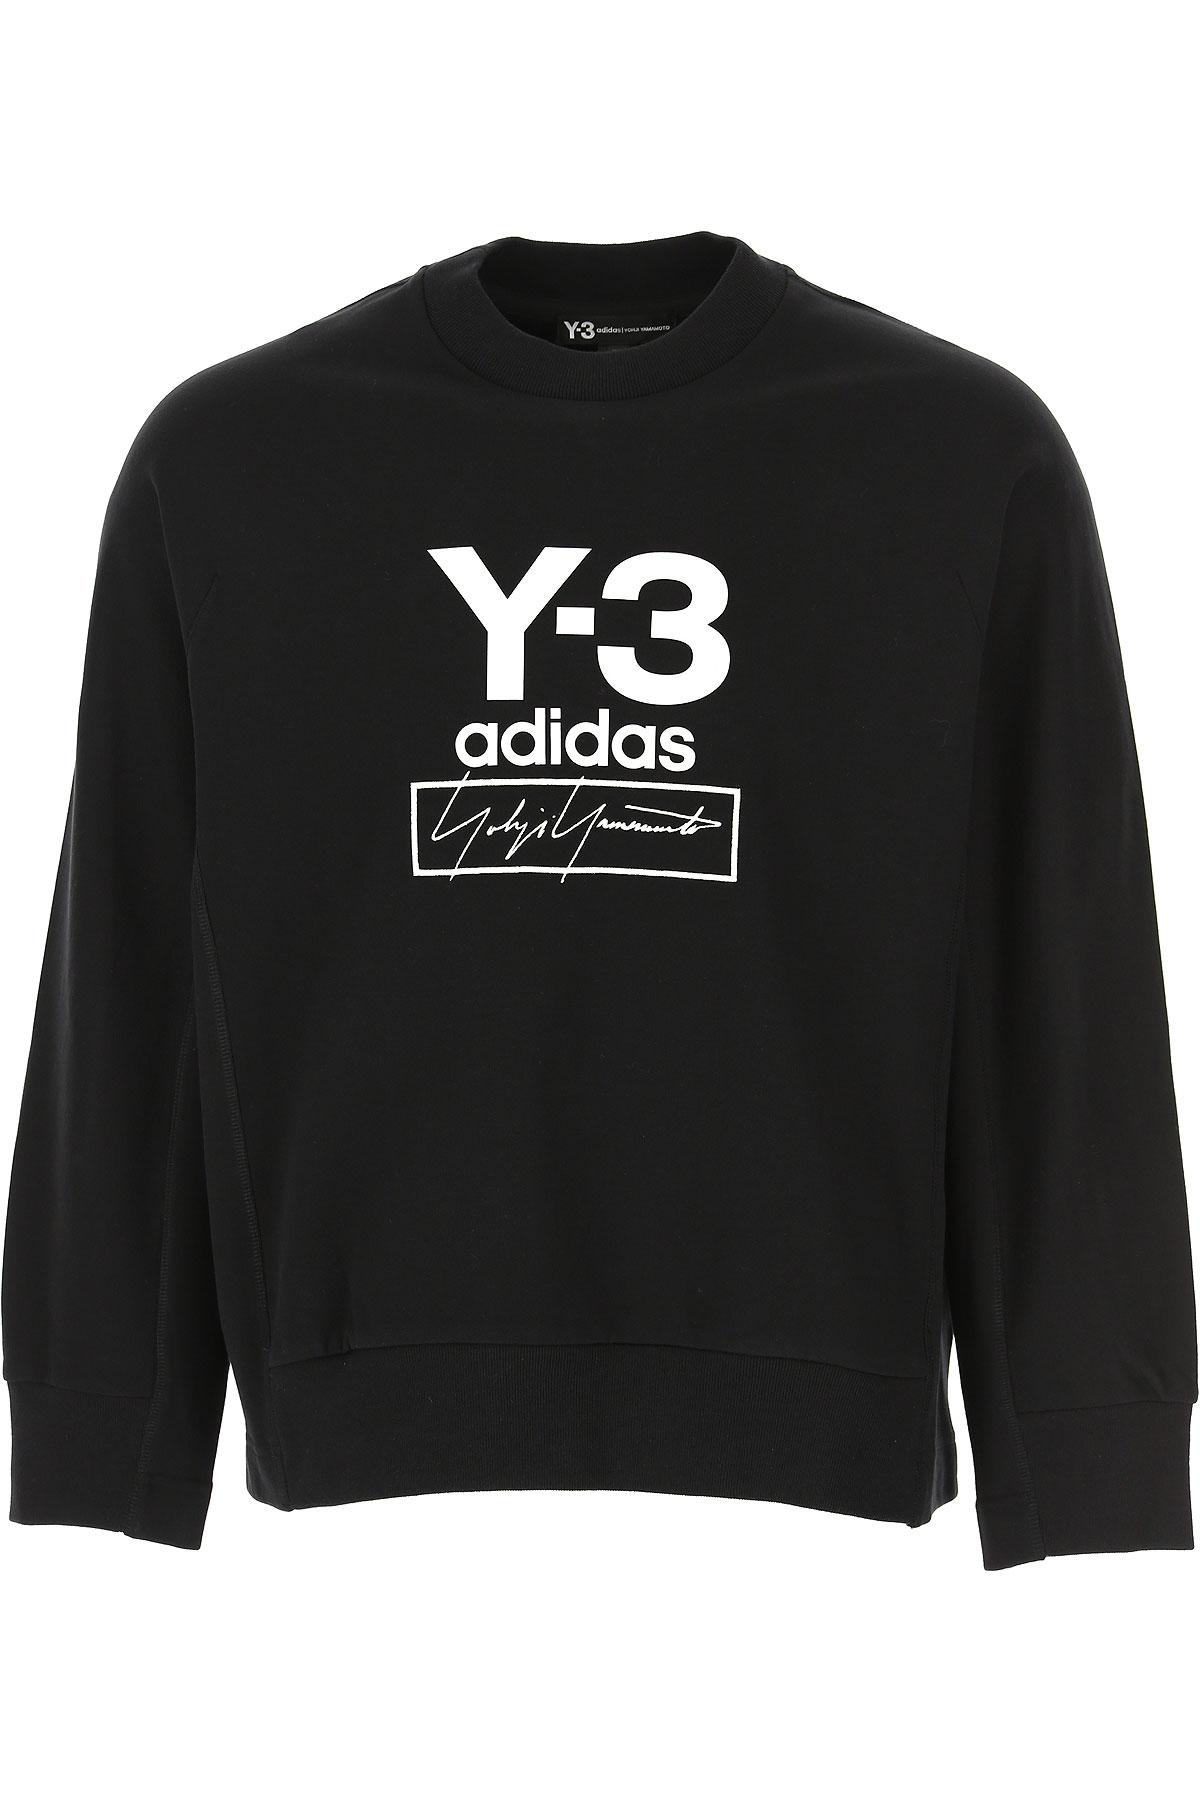 Y3 by Yohji Yamamoto Sweatshirt for Men On Sale, Black, Cotton, 2019, L XL